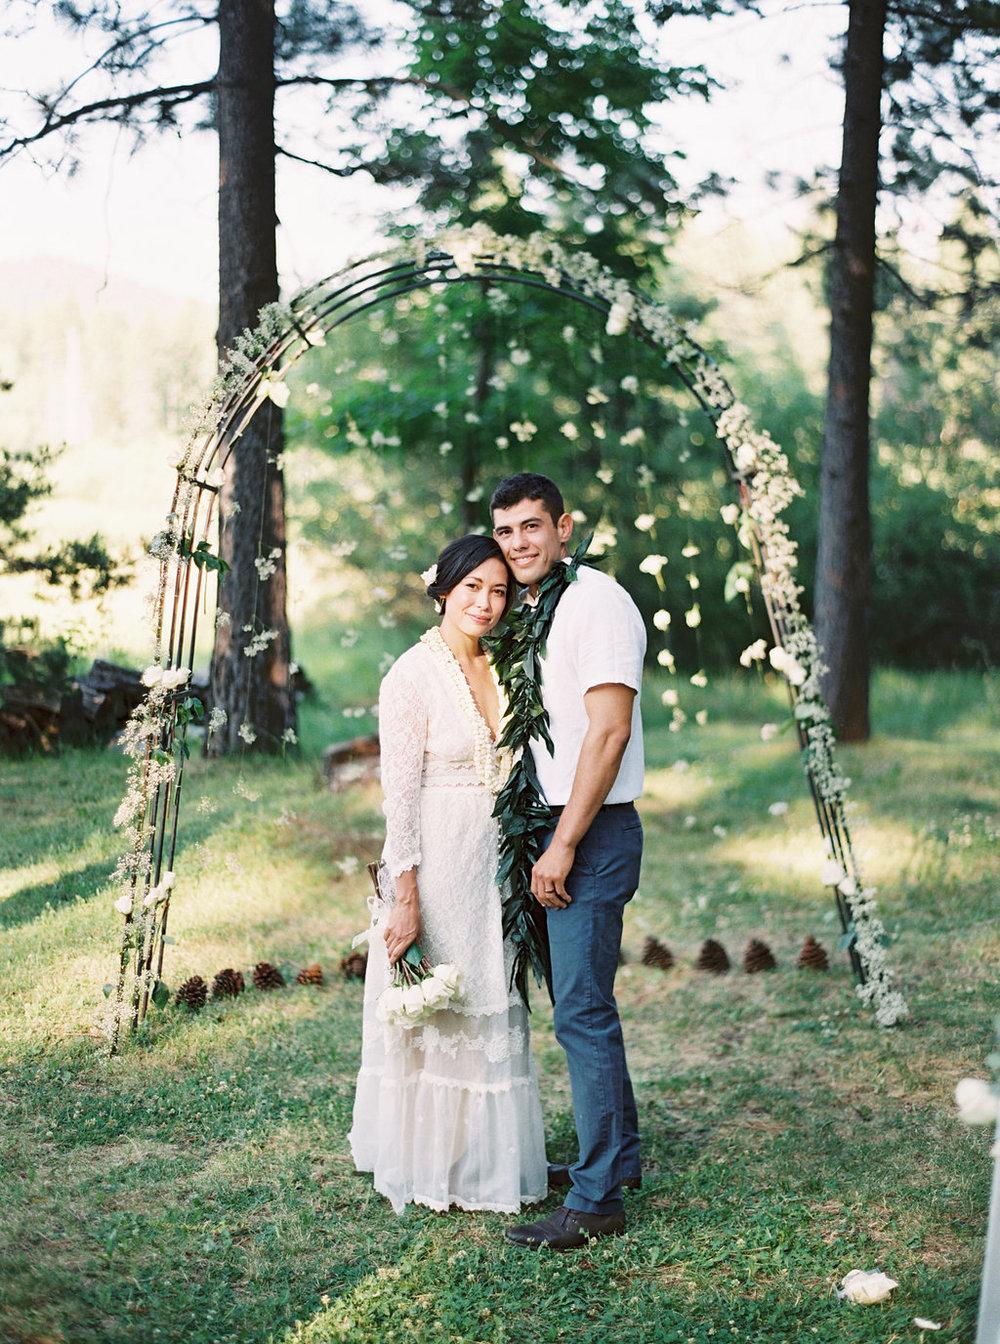 000028_gallardo_wedding_film0050.jpg